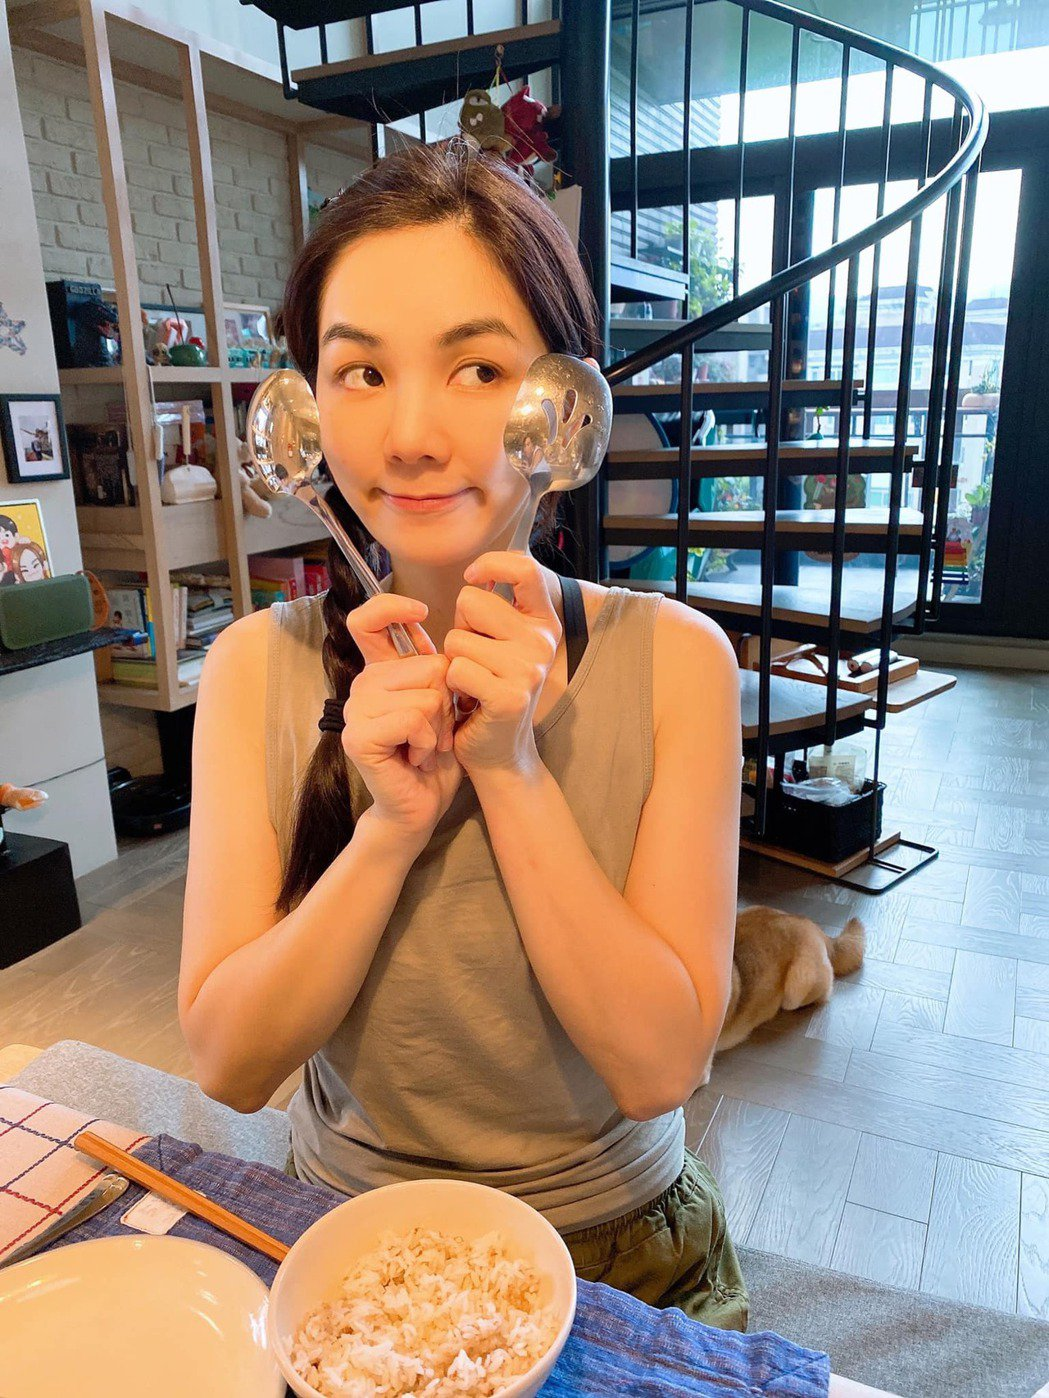 Ella(陳嘉樺)搖身一變「全職家庭主婦」。圖/摘自臉書